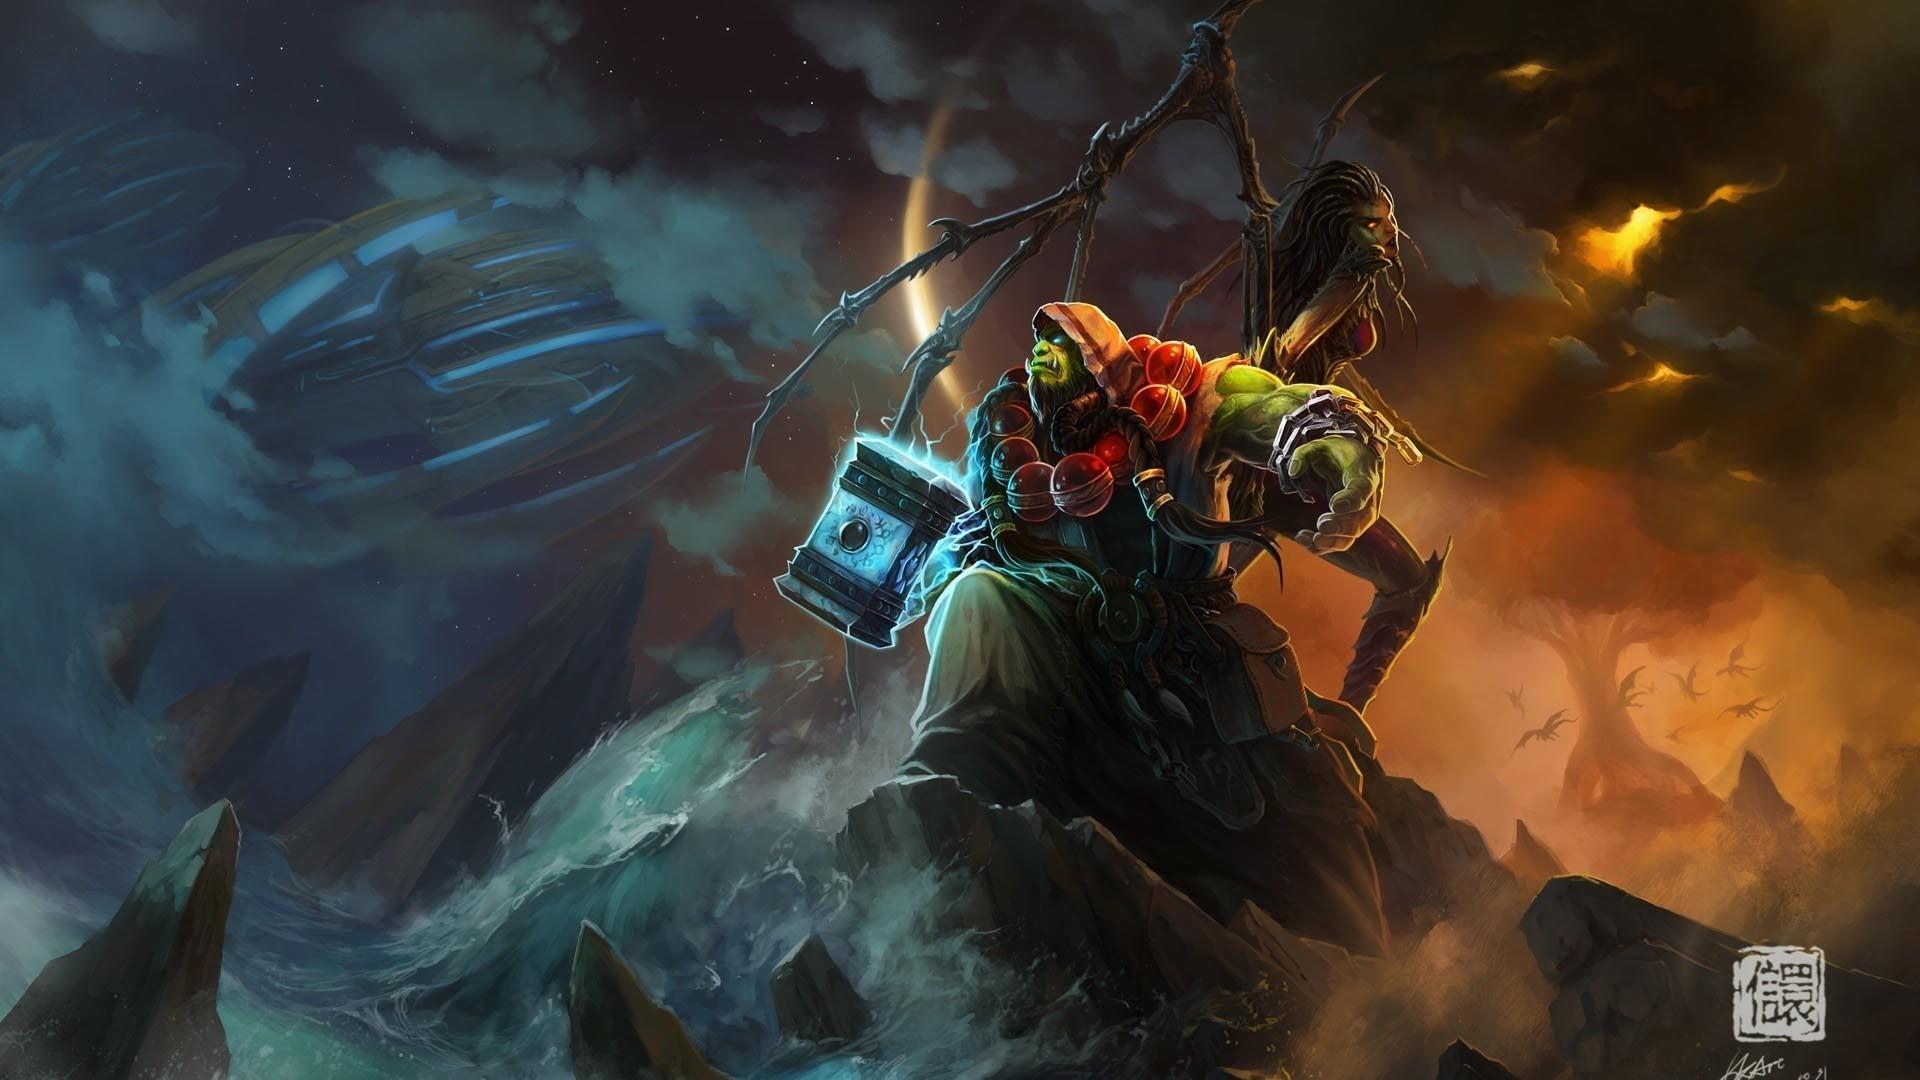 Free Wonderful World Of Warcraft Images, Kurt Goodnight